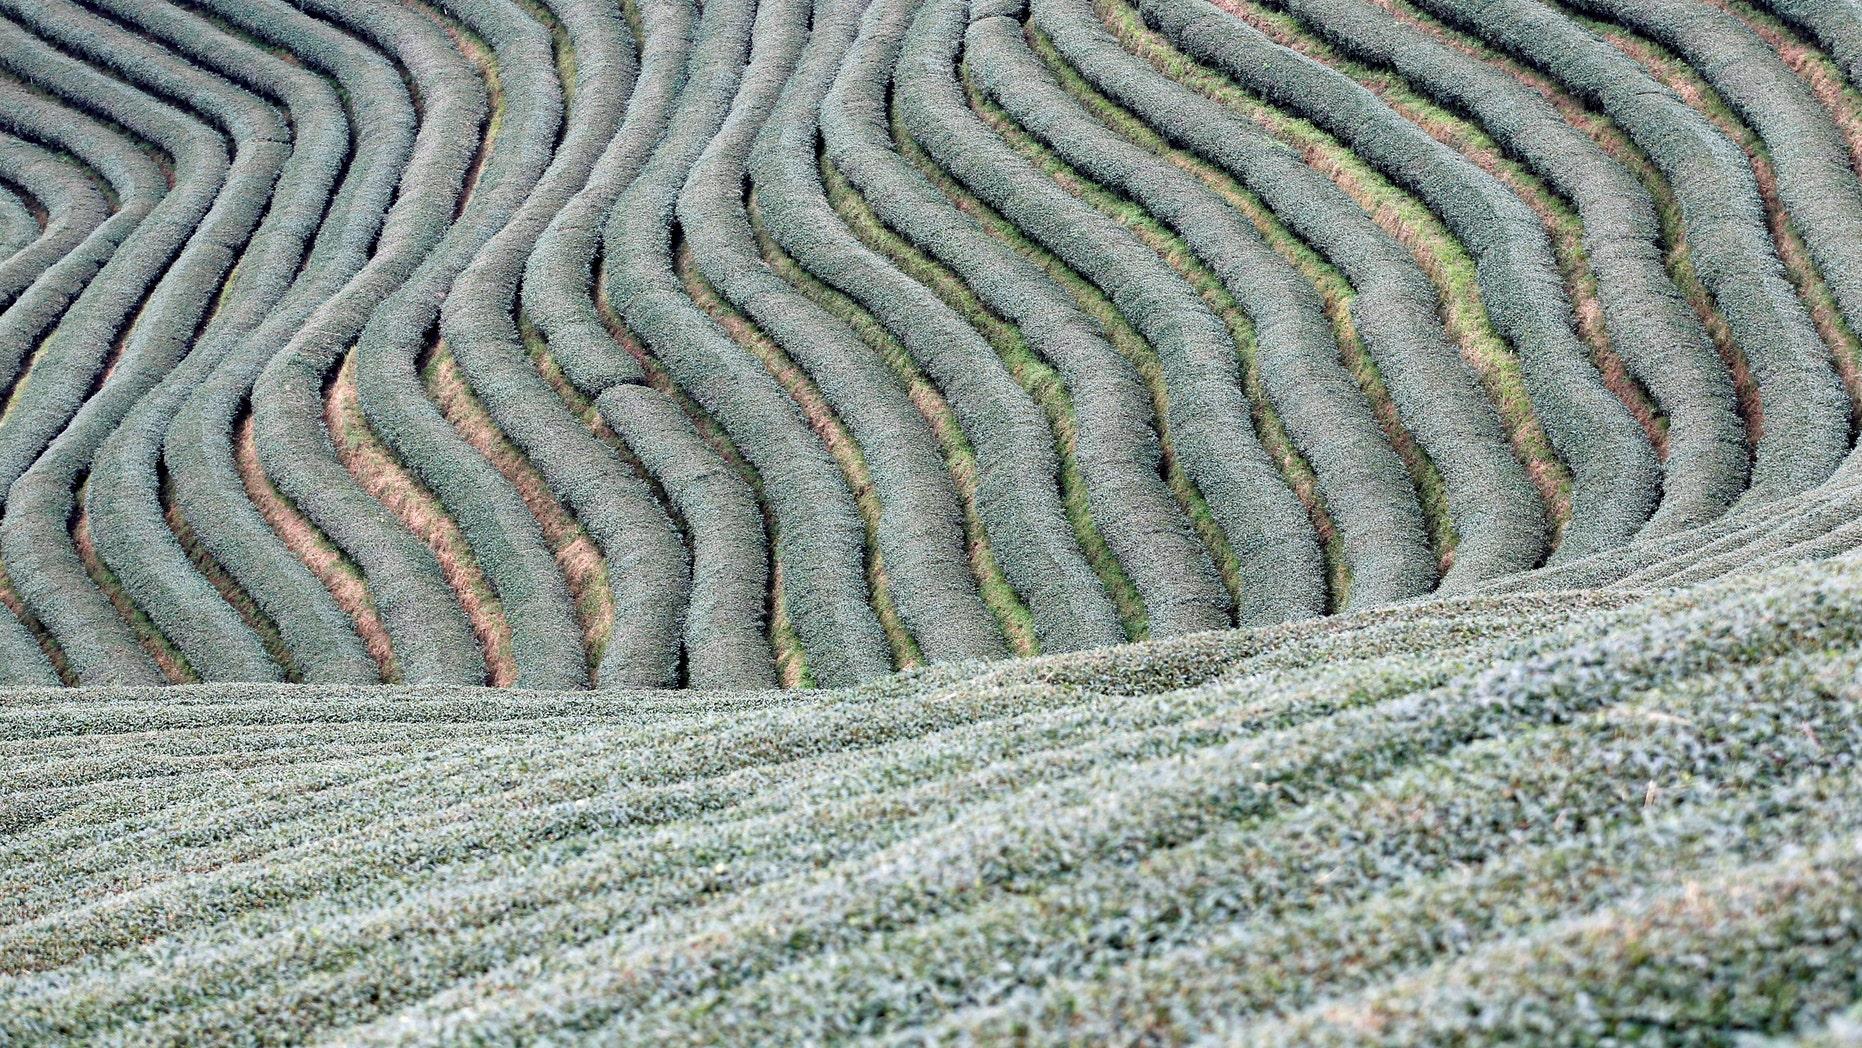 Workers work in tea leaf field at Mong Mao in ethnic Wa territory in north east Myanmar October 1, 2016. Picture taken on October 1, 2016. (REUTERS/Soe Zeya Tun)